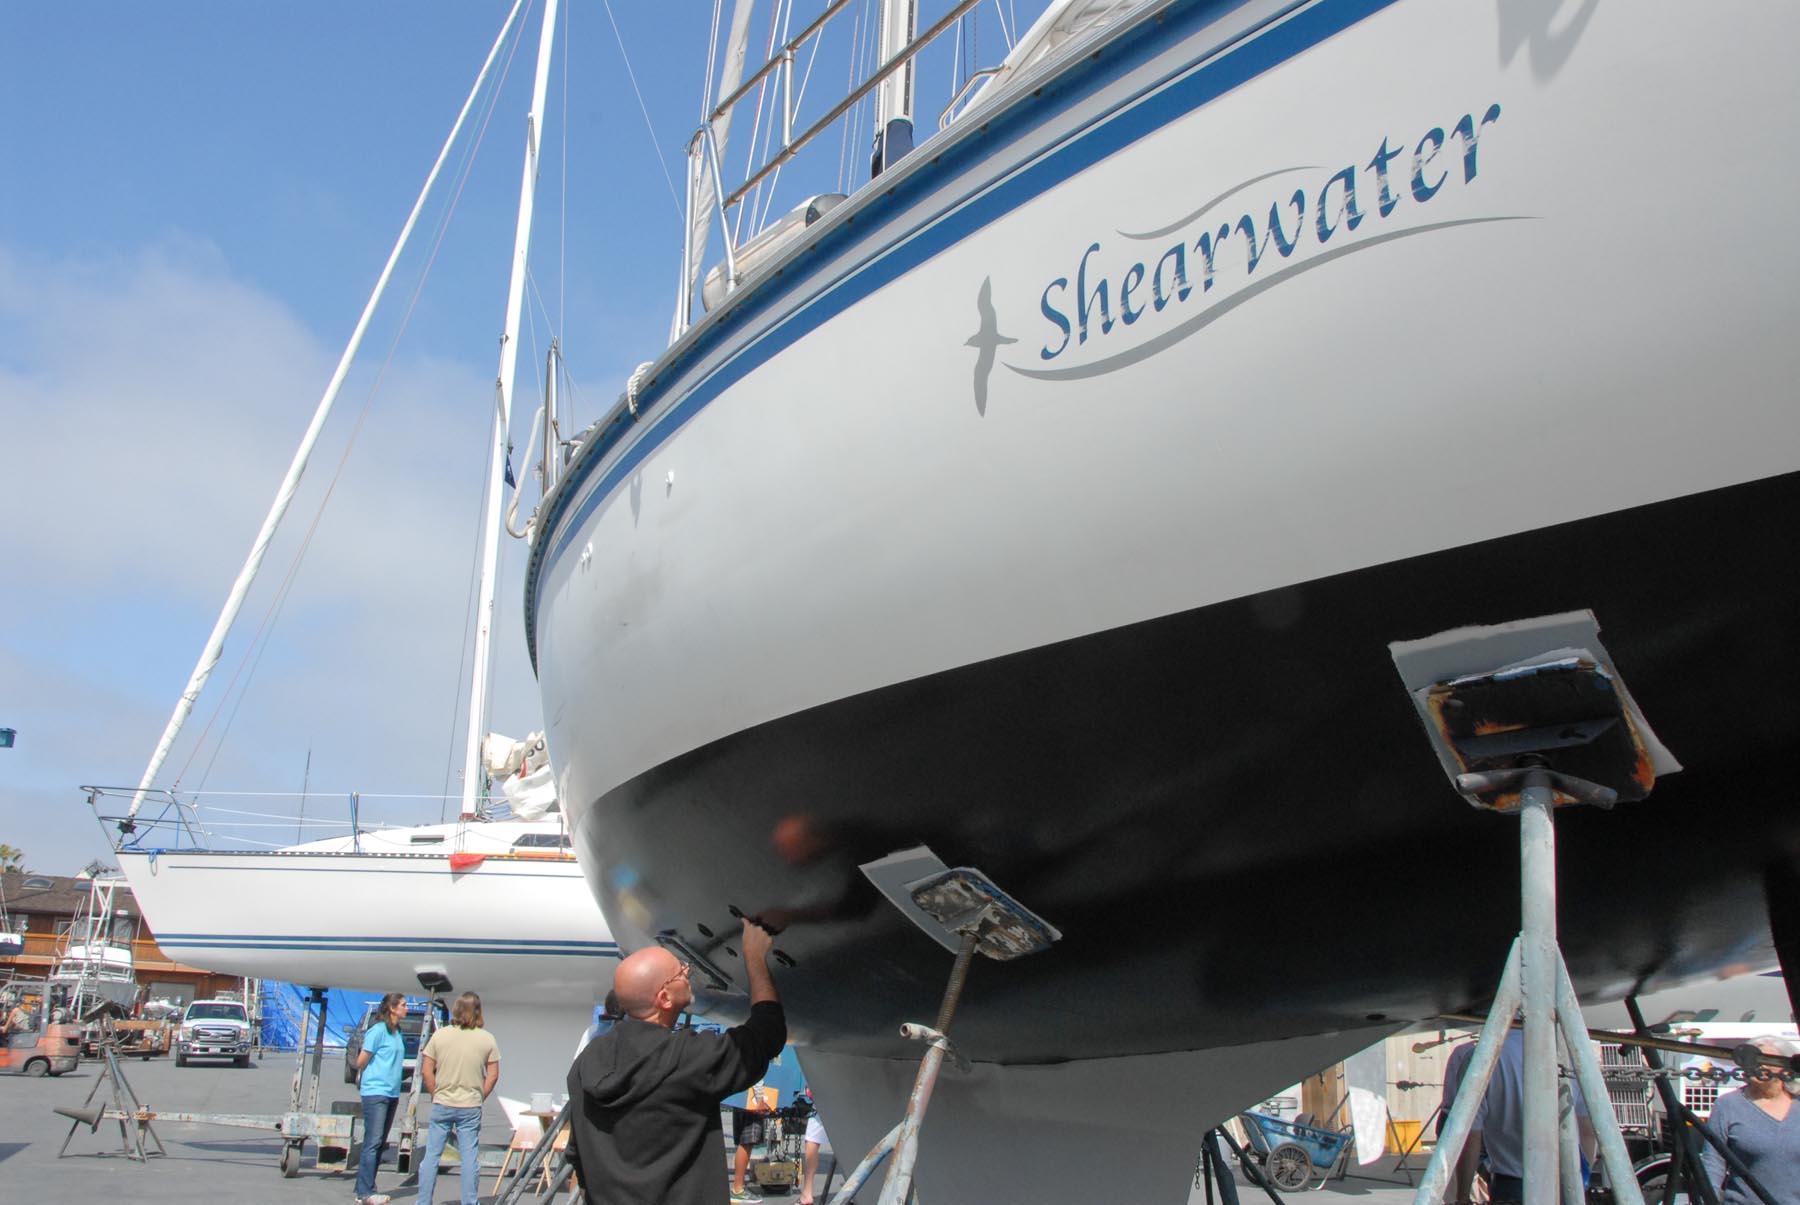 San Diego Postpones Eco-Friendly Hull Paint Expo